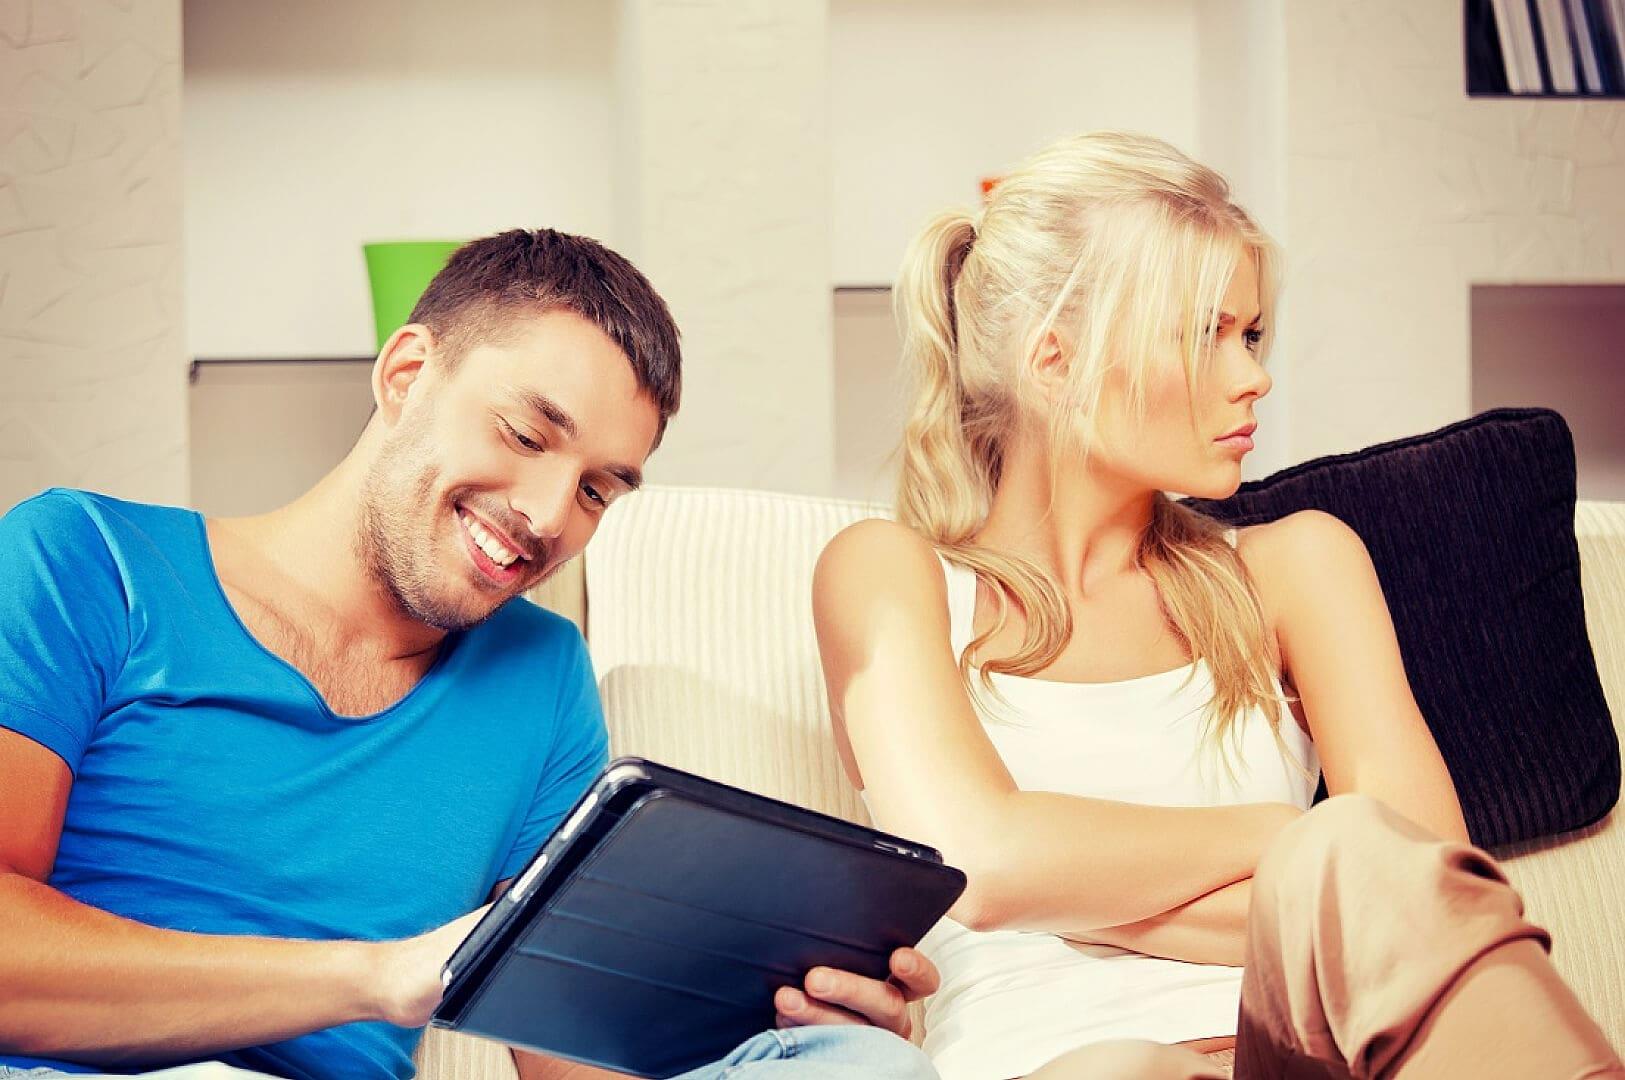 Мужчина и женщина интернет